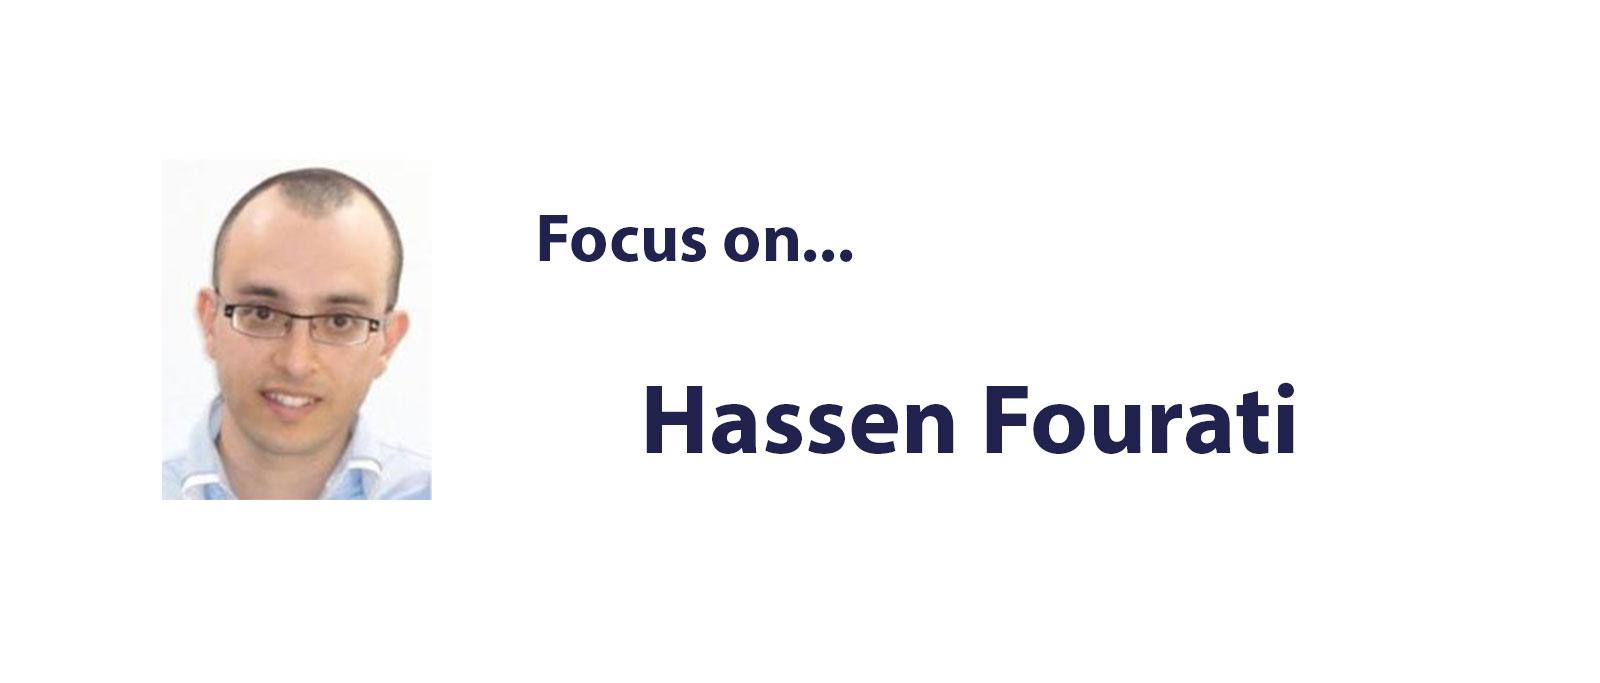 Focus on Hassen Fourati